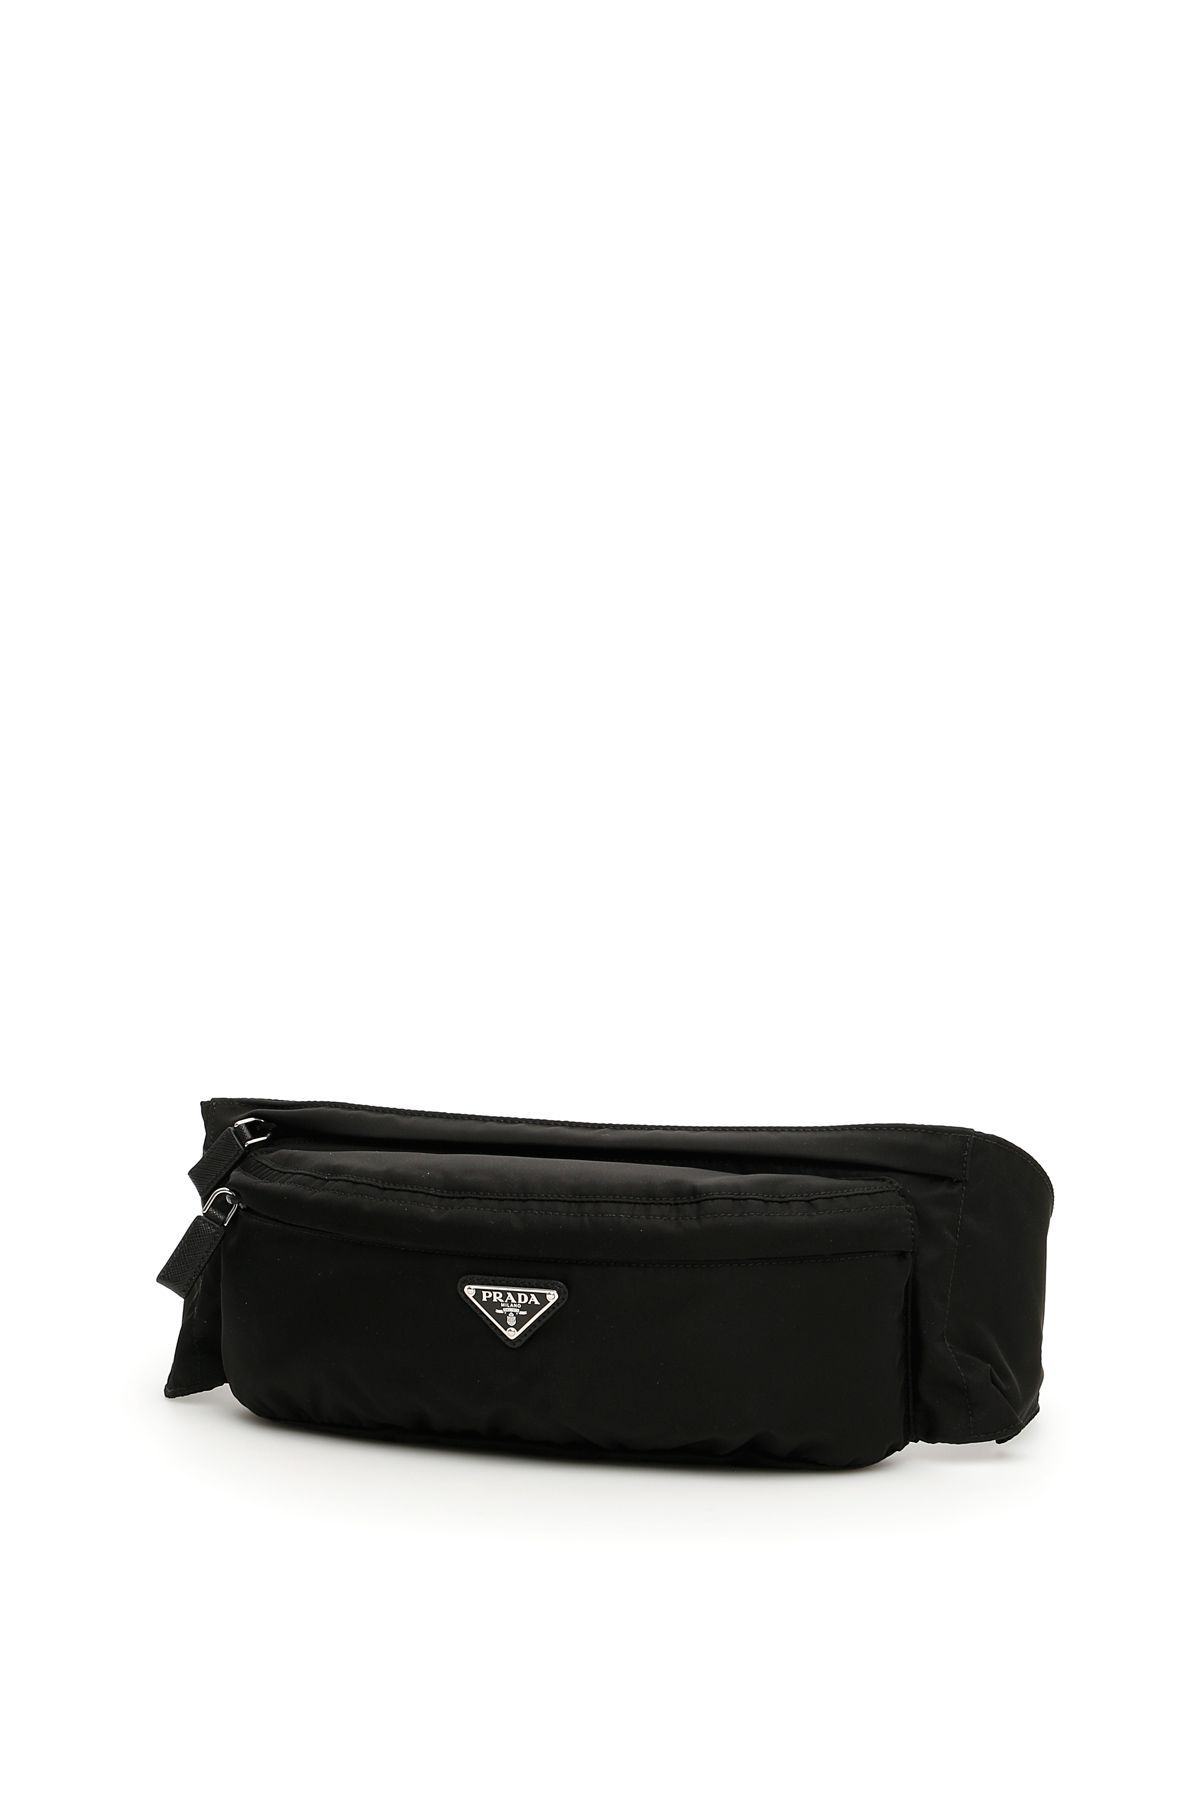 c9935fea60cc PRADA NYLON FANNY PACK.  prada  bags  belt bags  nylon  lining ...